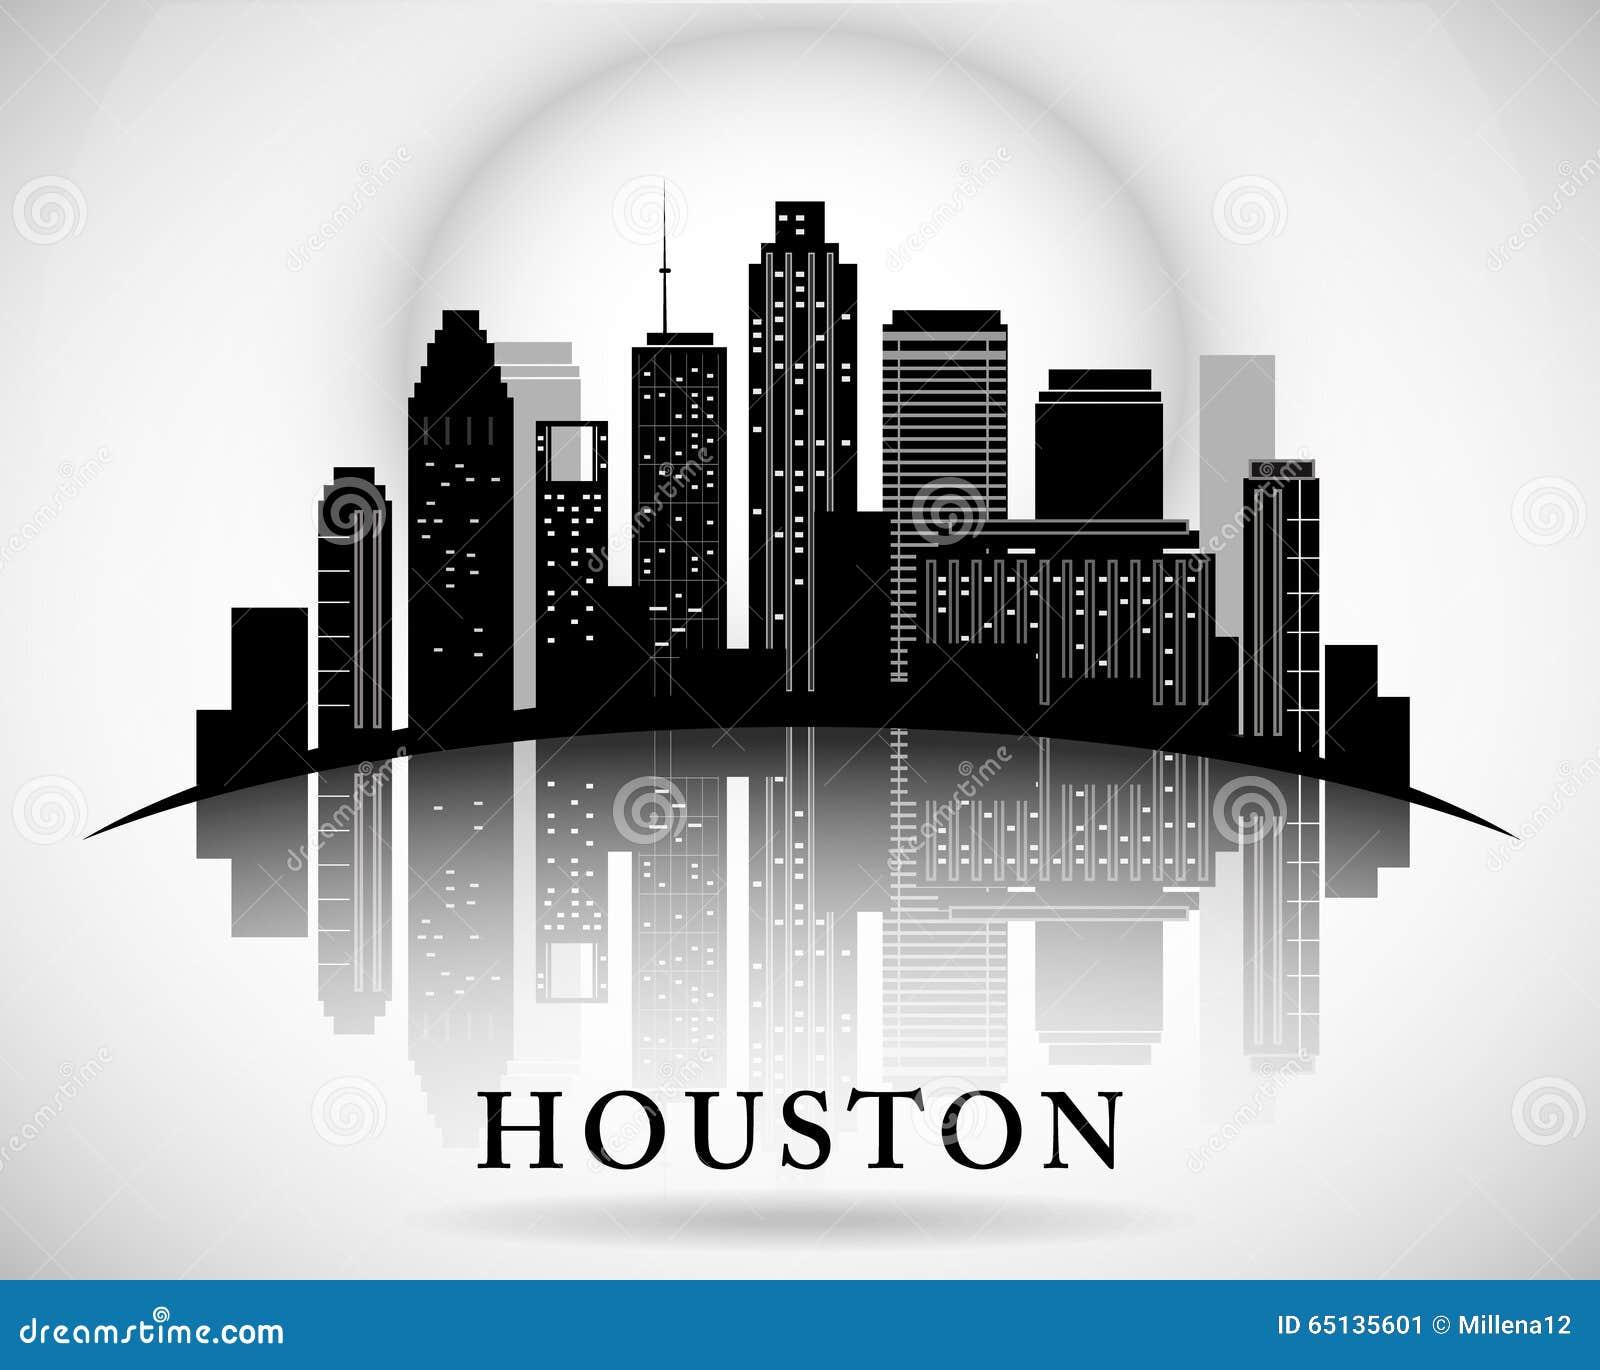 Houston Texas Skyline City Silhouette Stock Vector - Image